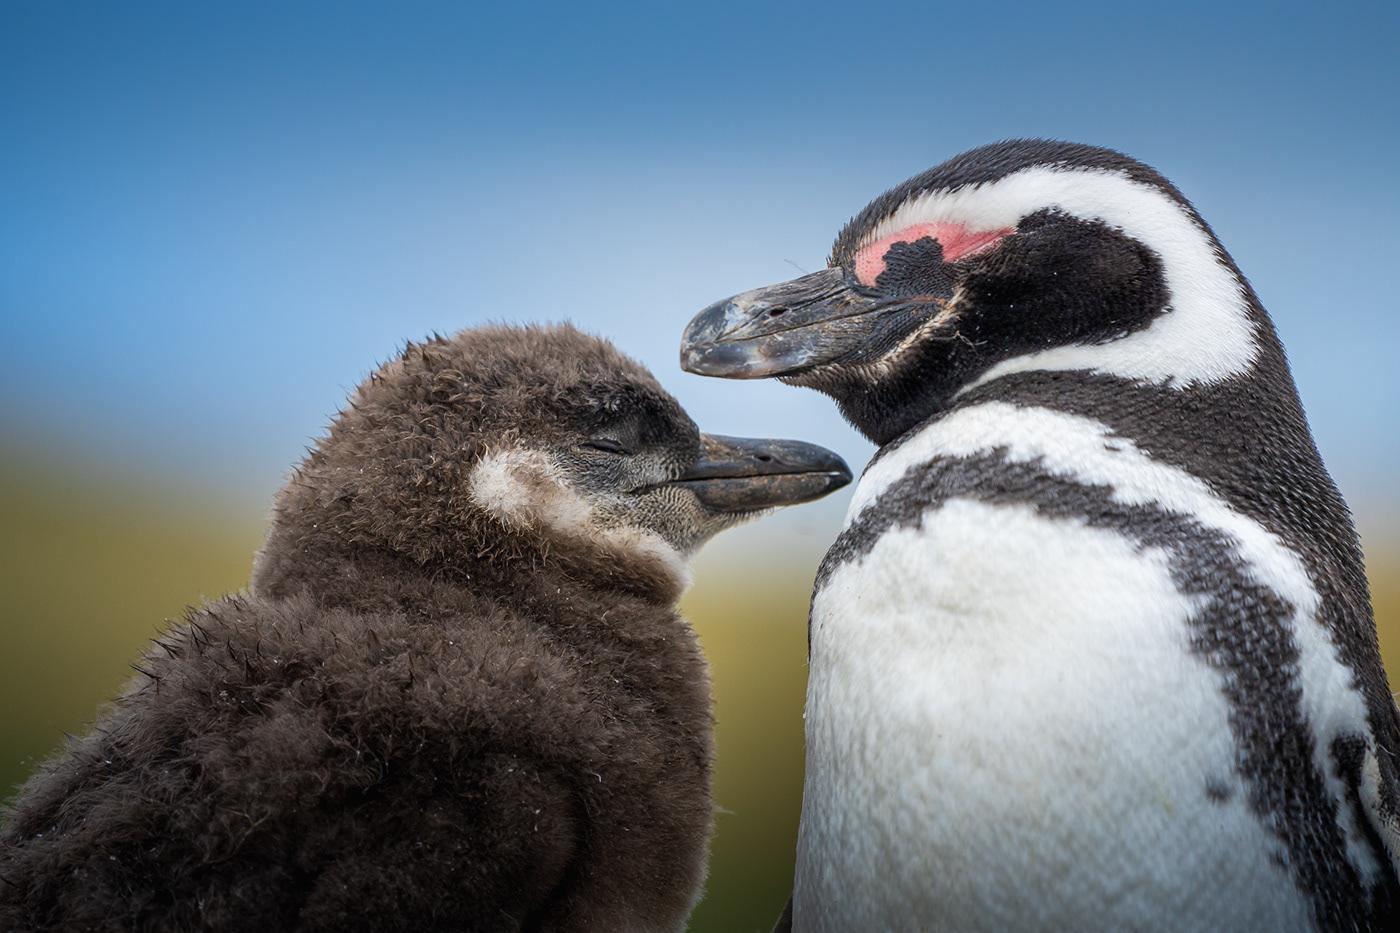 antarctic antarctica cute gentoo global warming ice magdalena penguins